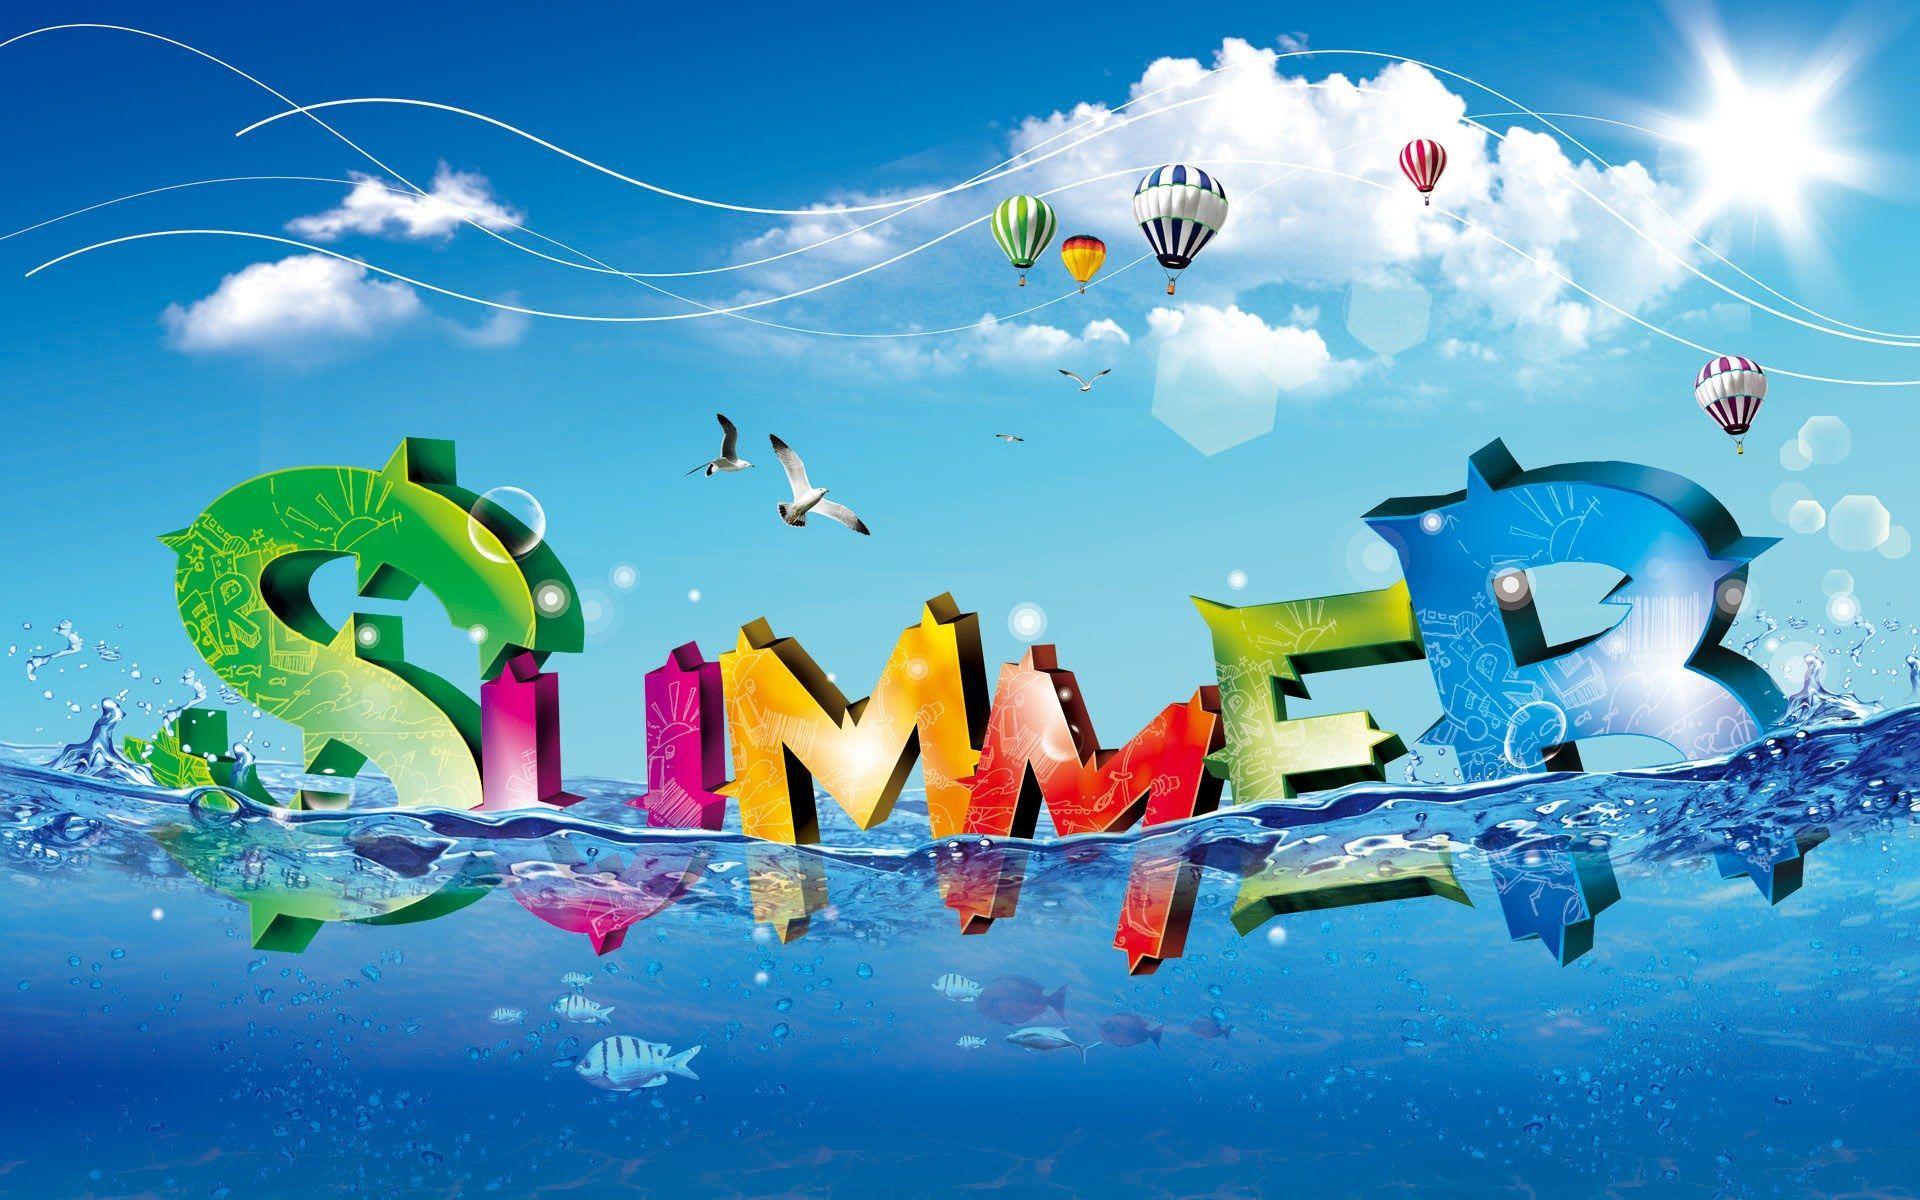 Summertime Desktop Backgrounds - Wallpaper Cave